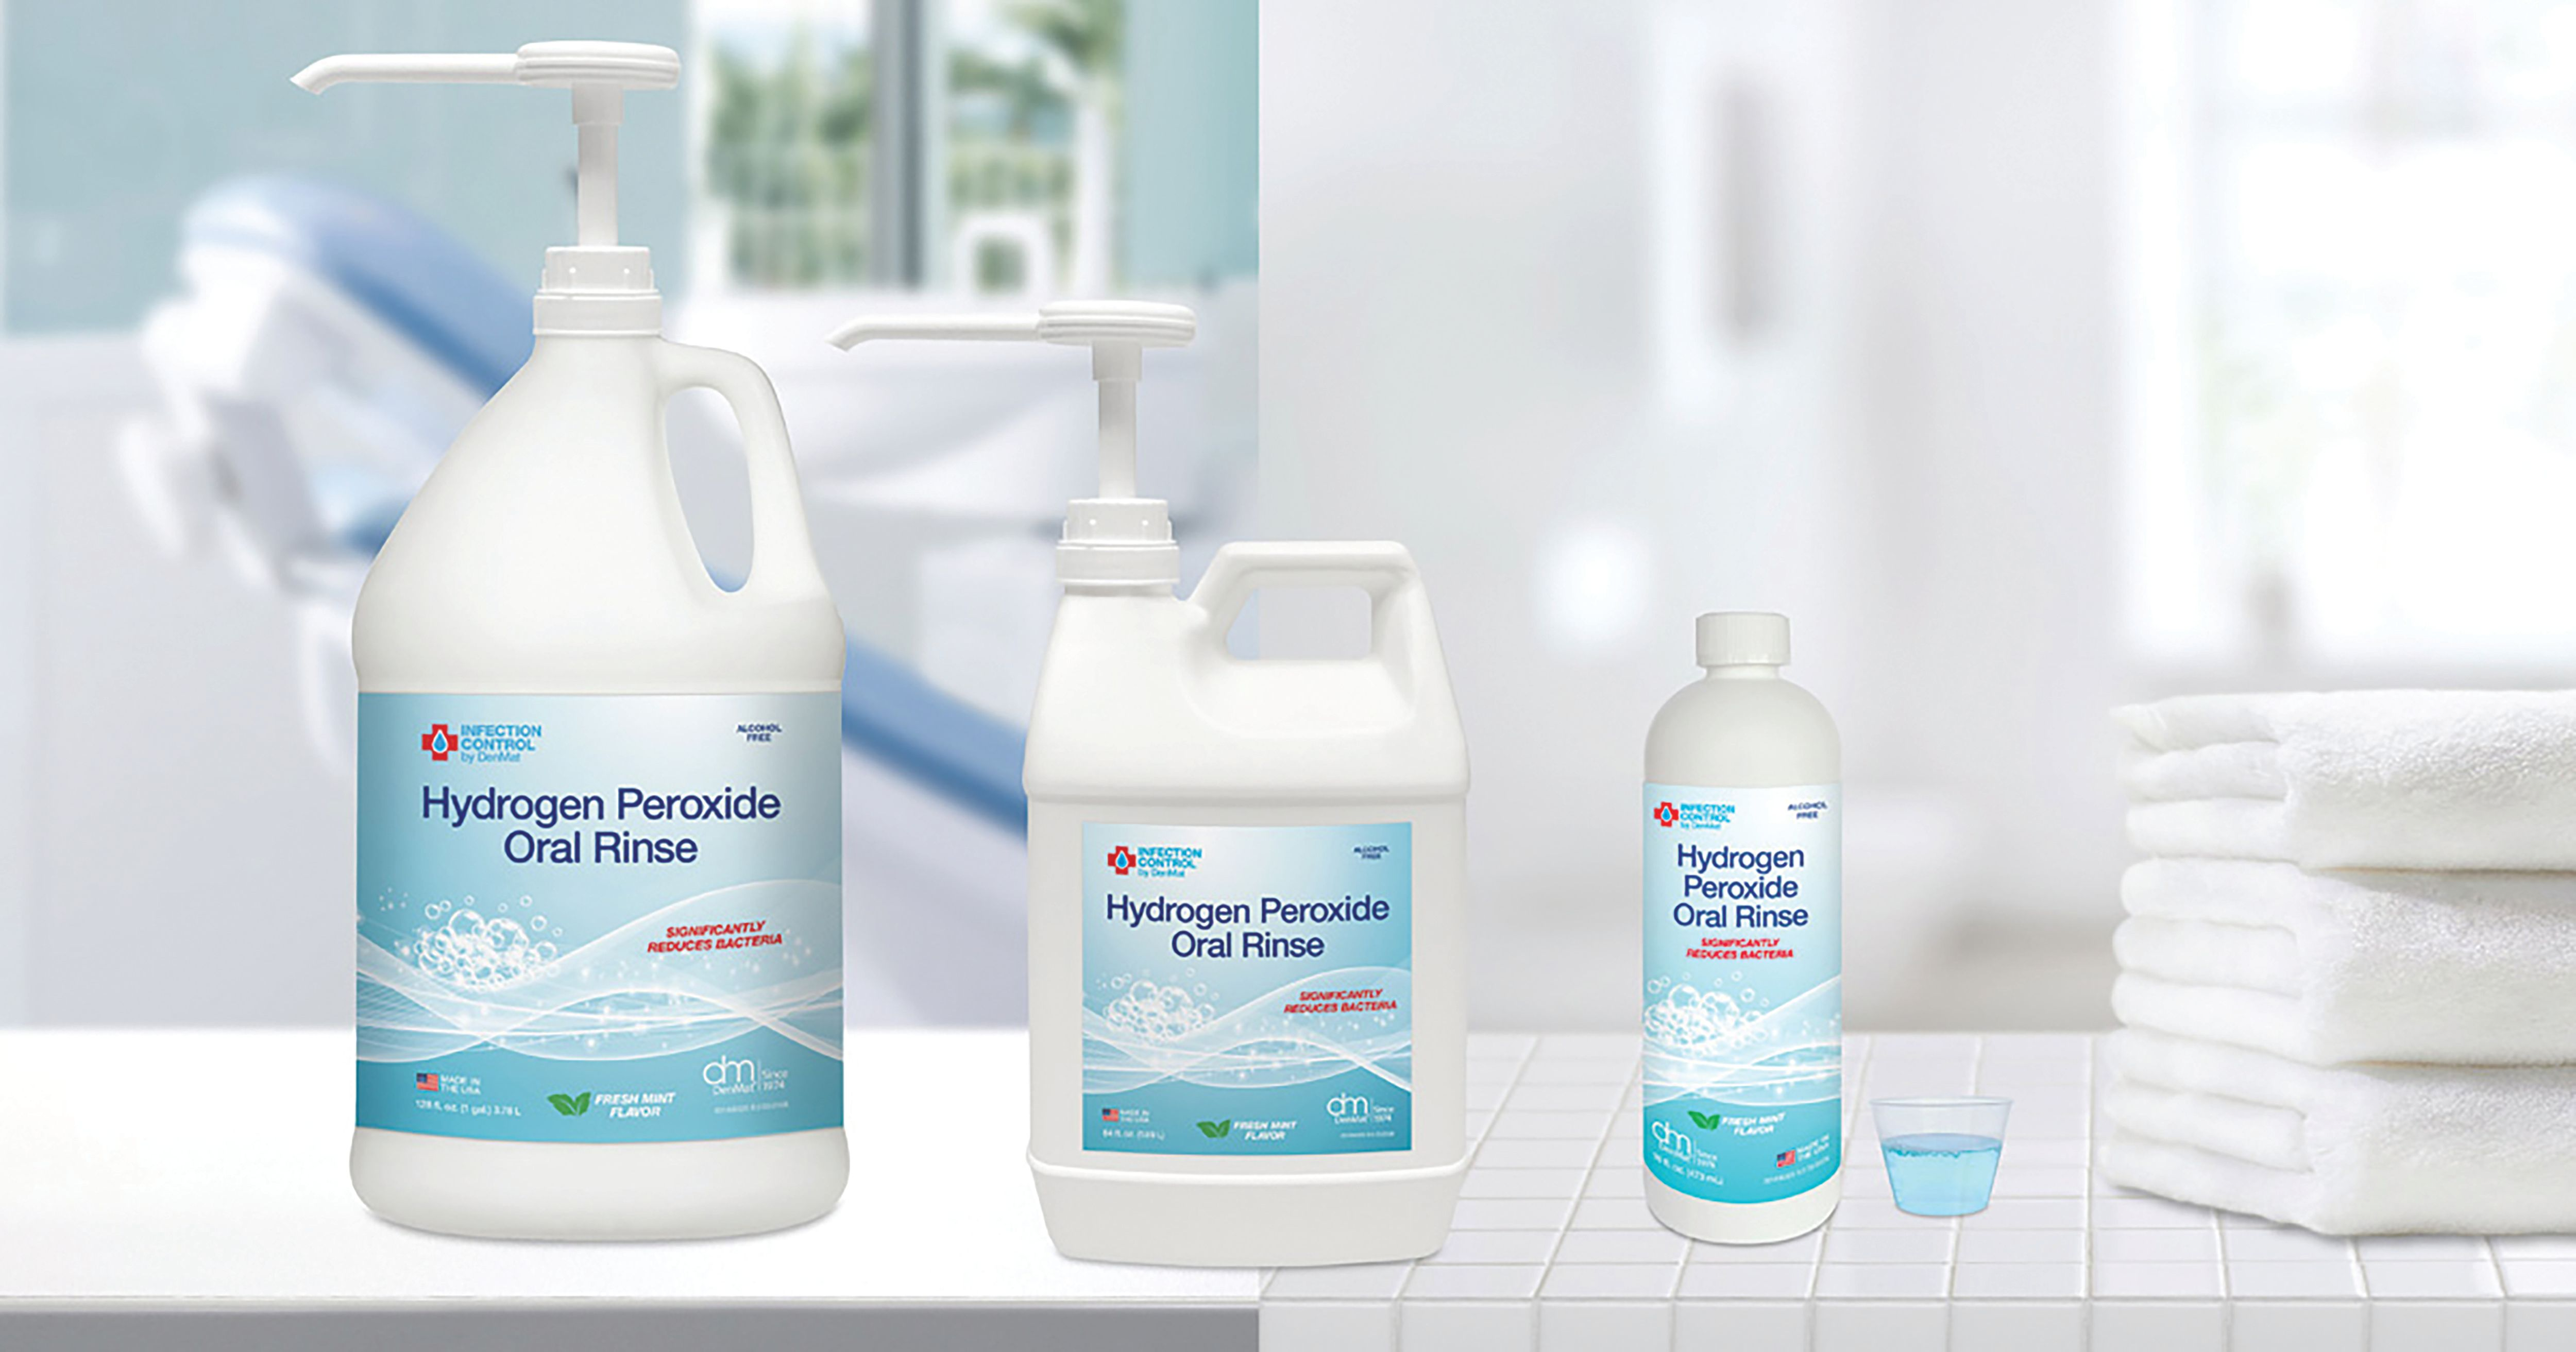 DenMat Hydrogen Peroxide Oral Rinse